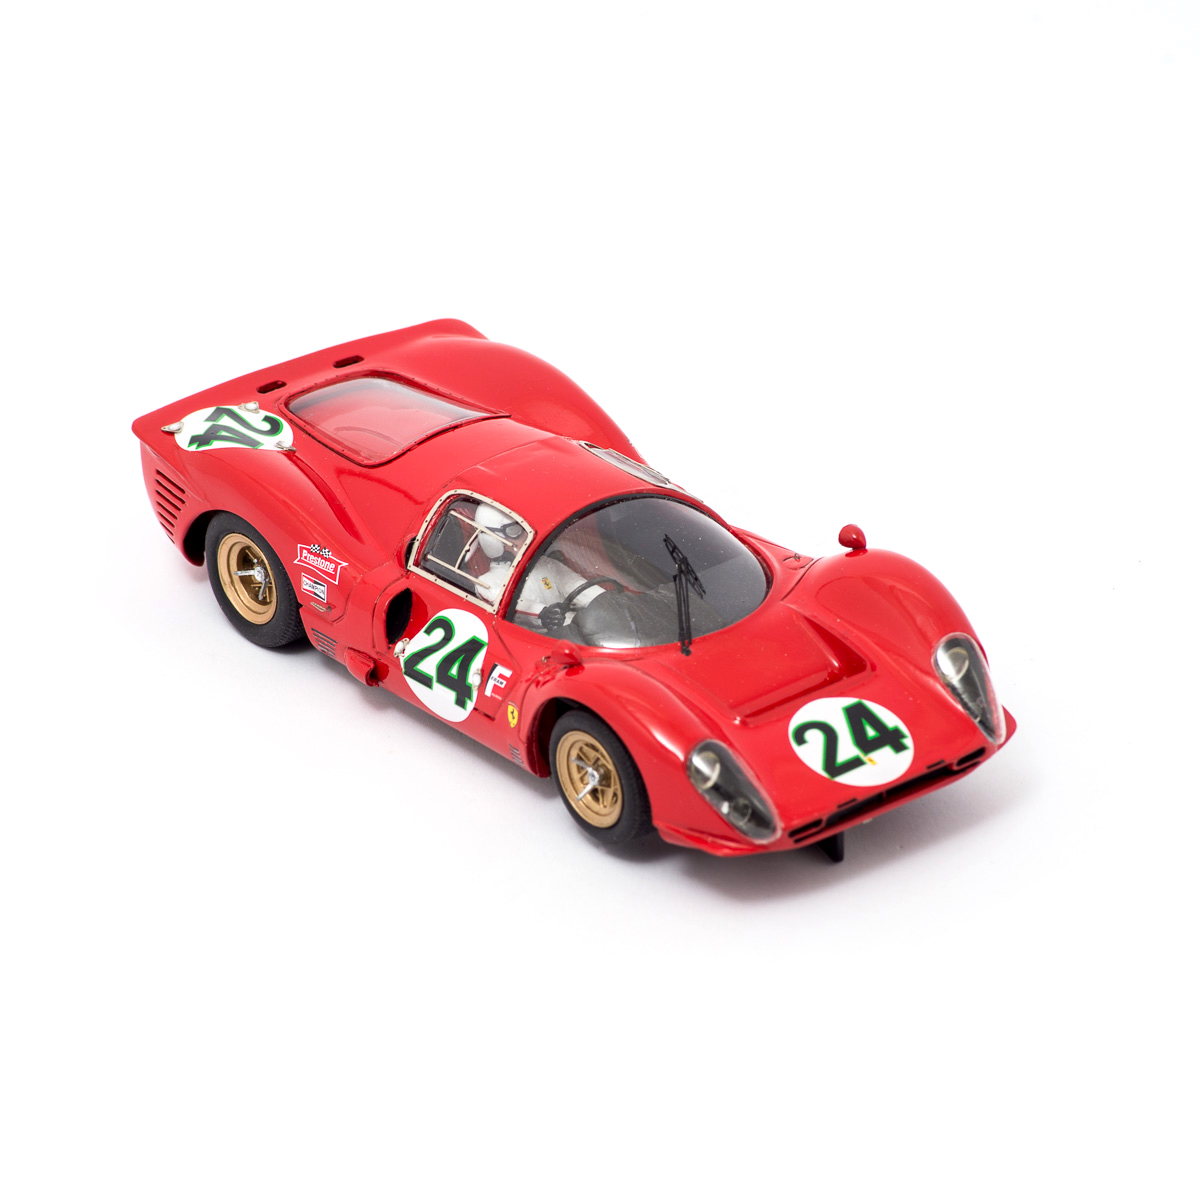 Slot Car Ferrari 330 P4 Coupè #24 Scarfiotti/Parkes 1:24